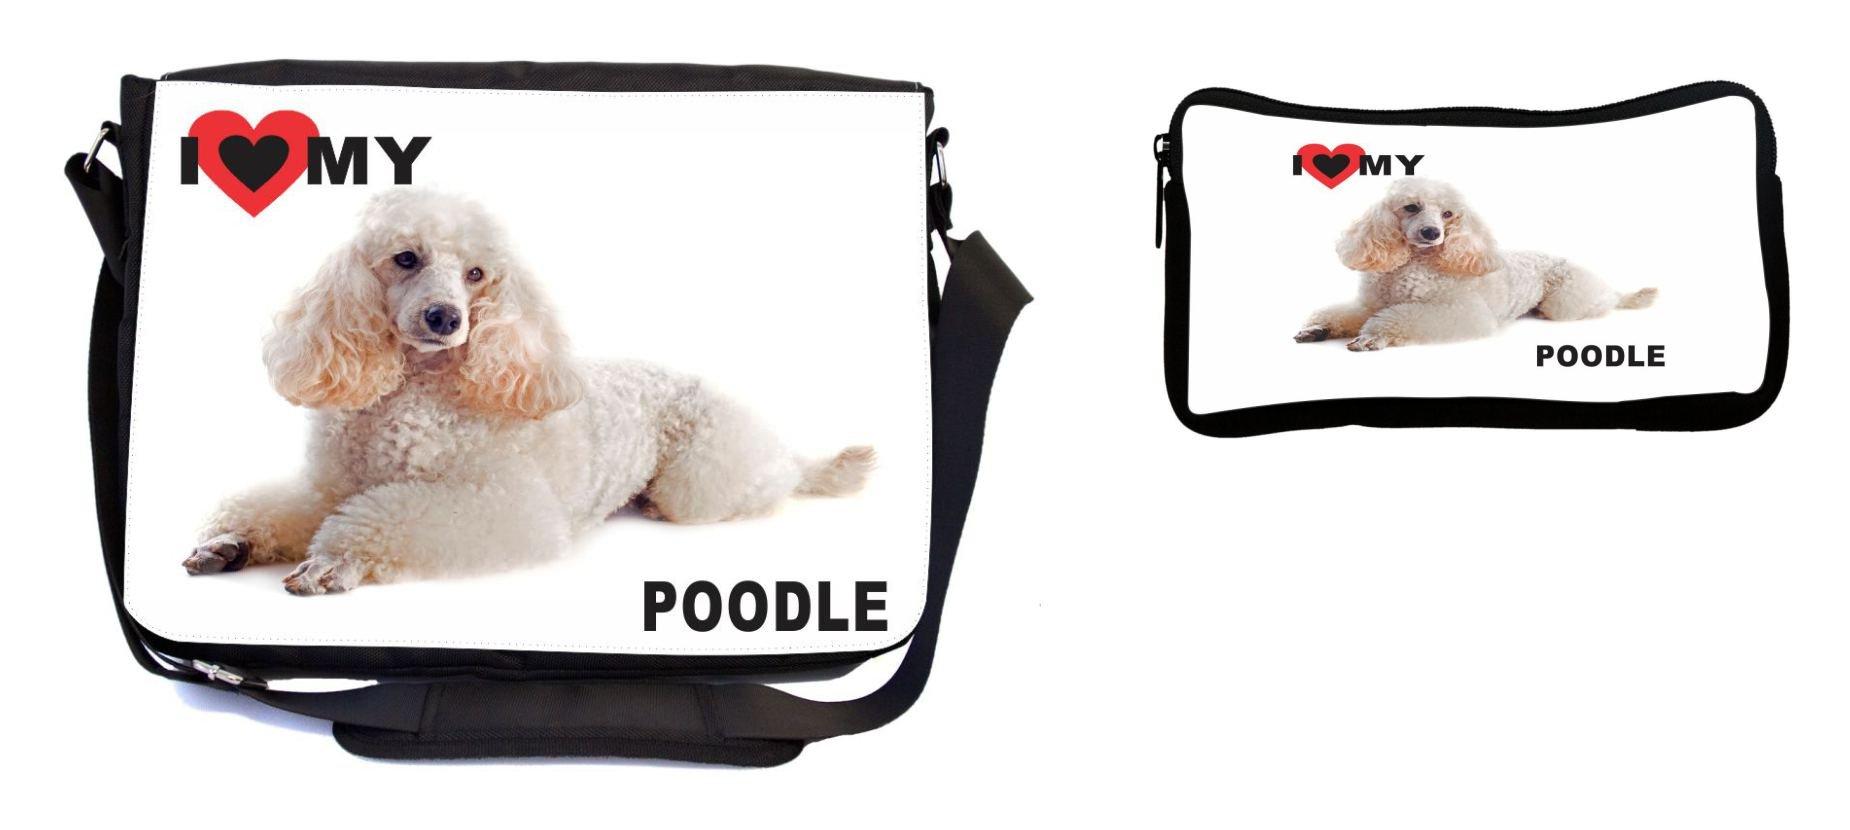 Rikki Knight I Love My White Poodle Dog Design Multifunction Messenger Bag - School Bag - Laptop Bag - with Padded Insert for School or Work - Includes Pencil Case